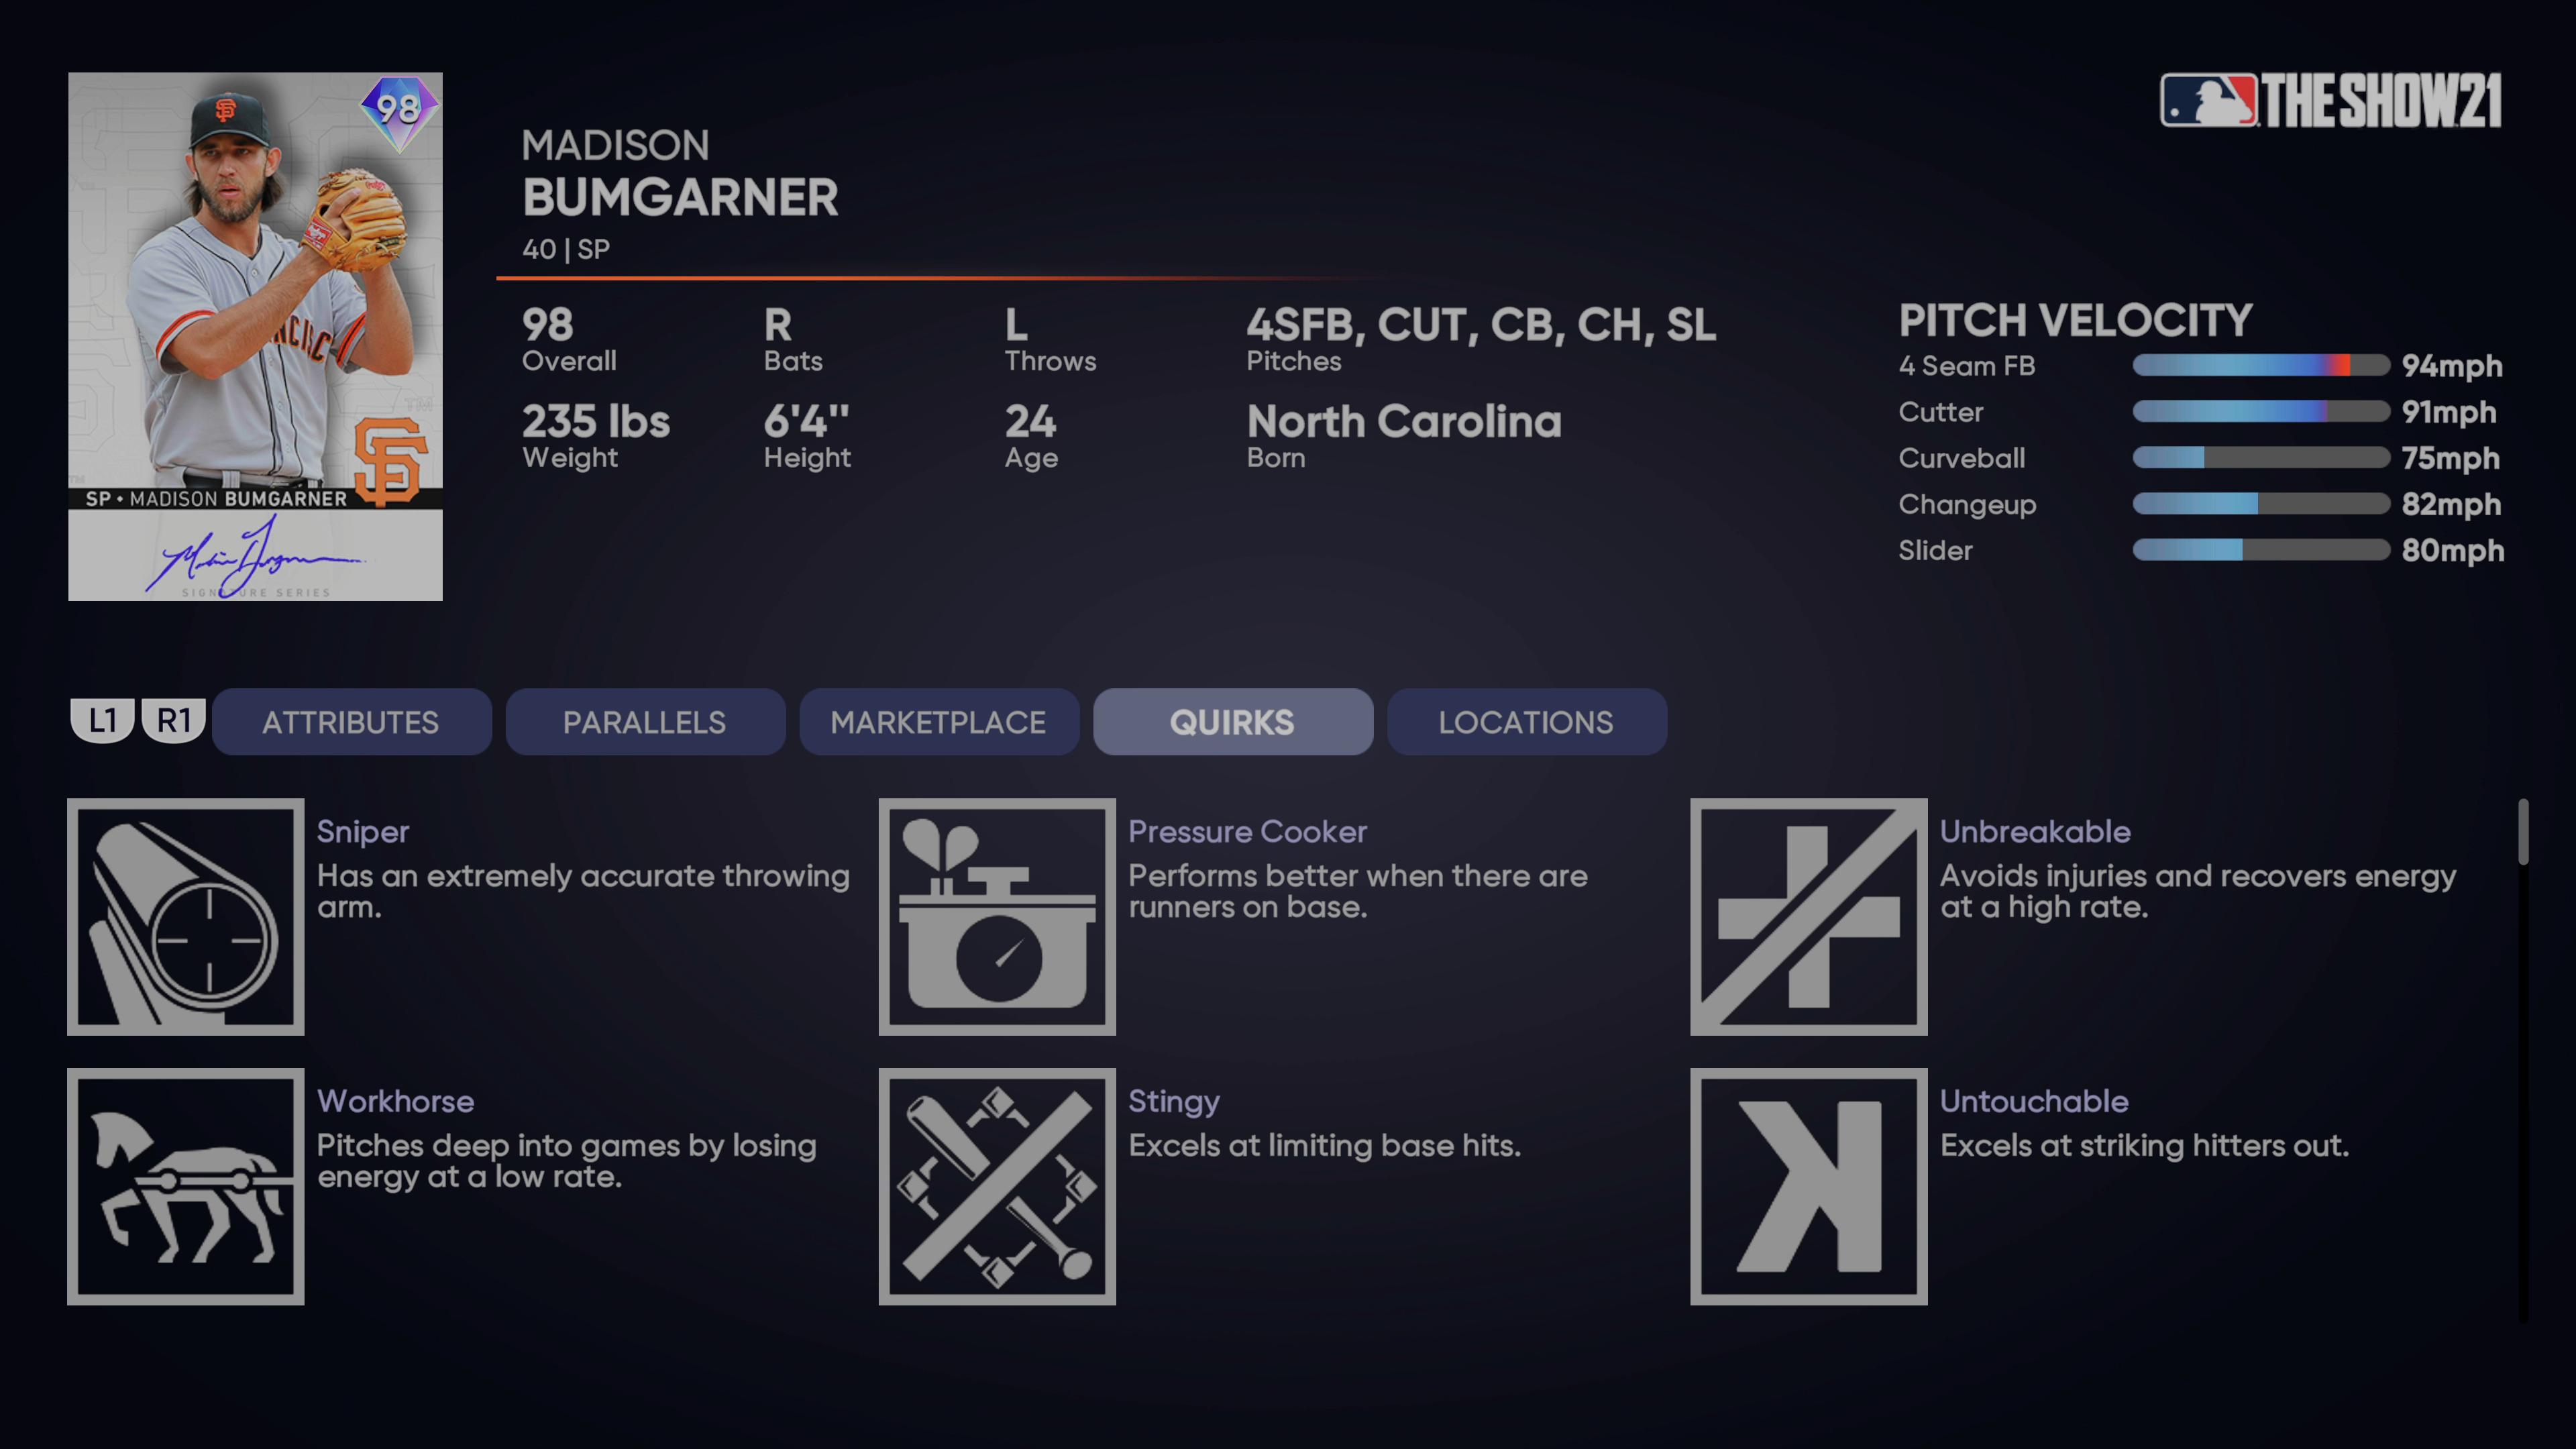 MLB The Show 21 - Headliners Set 32 Signature Series Madison Bumgarner_2021-08-24_15-26-11